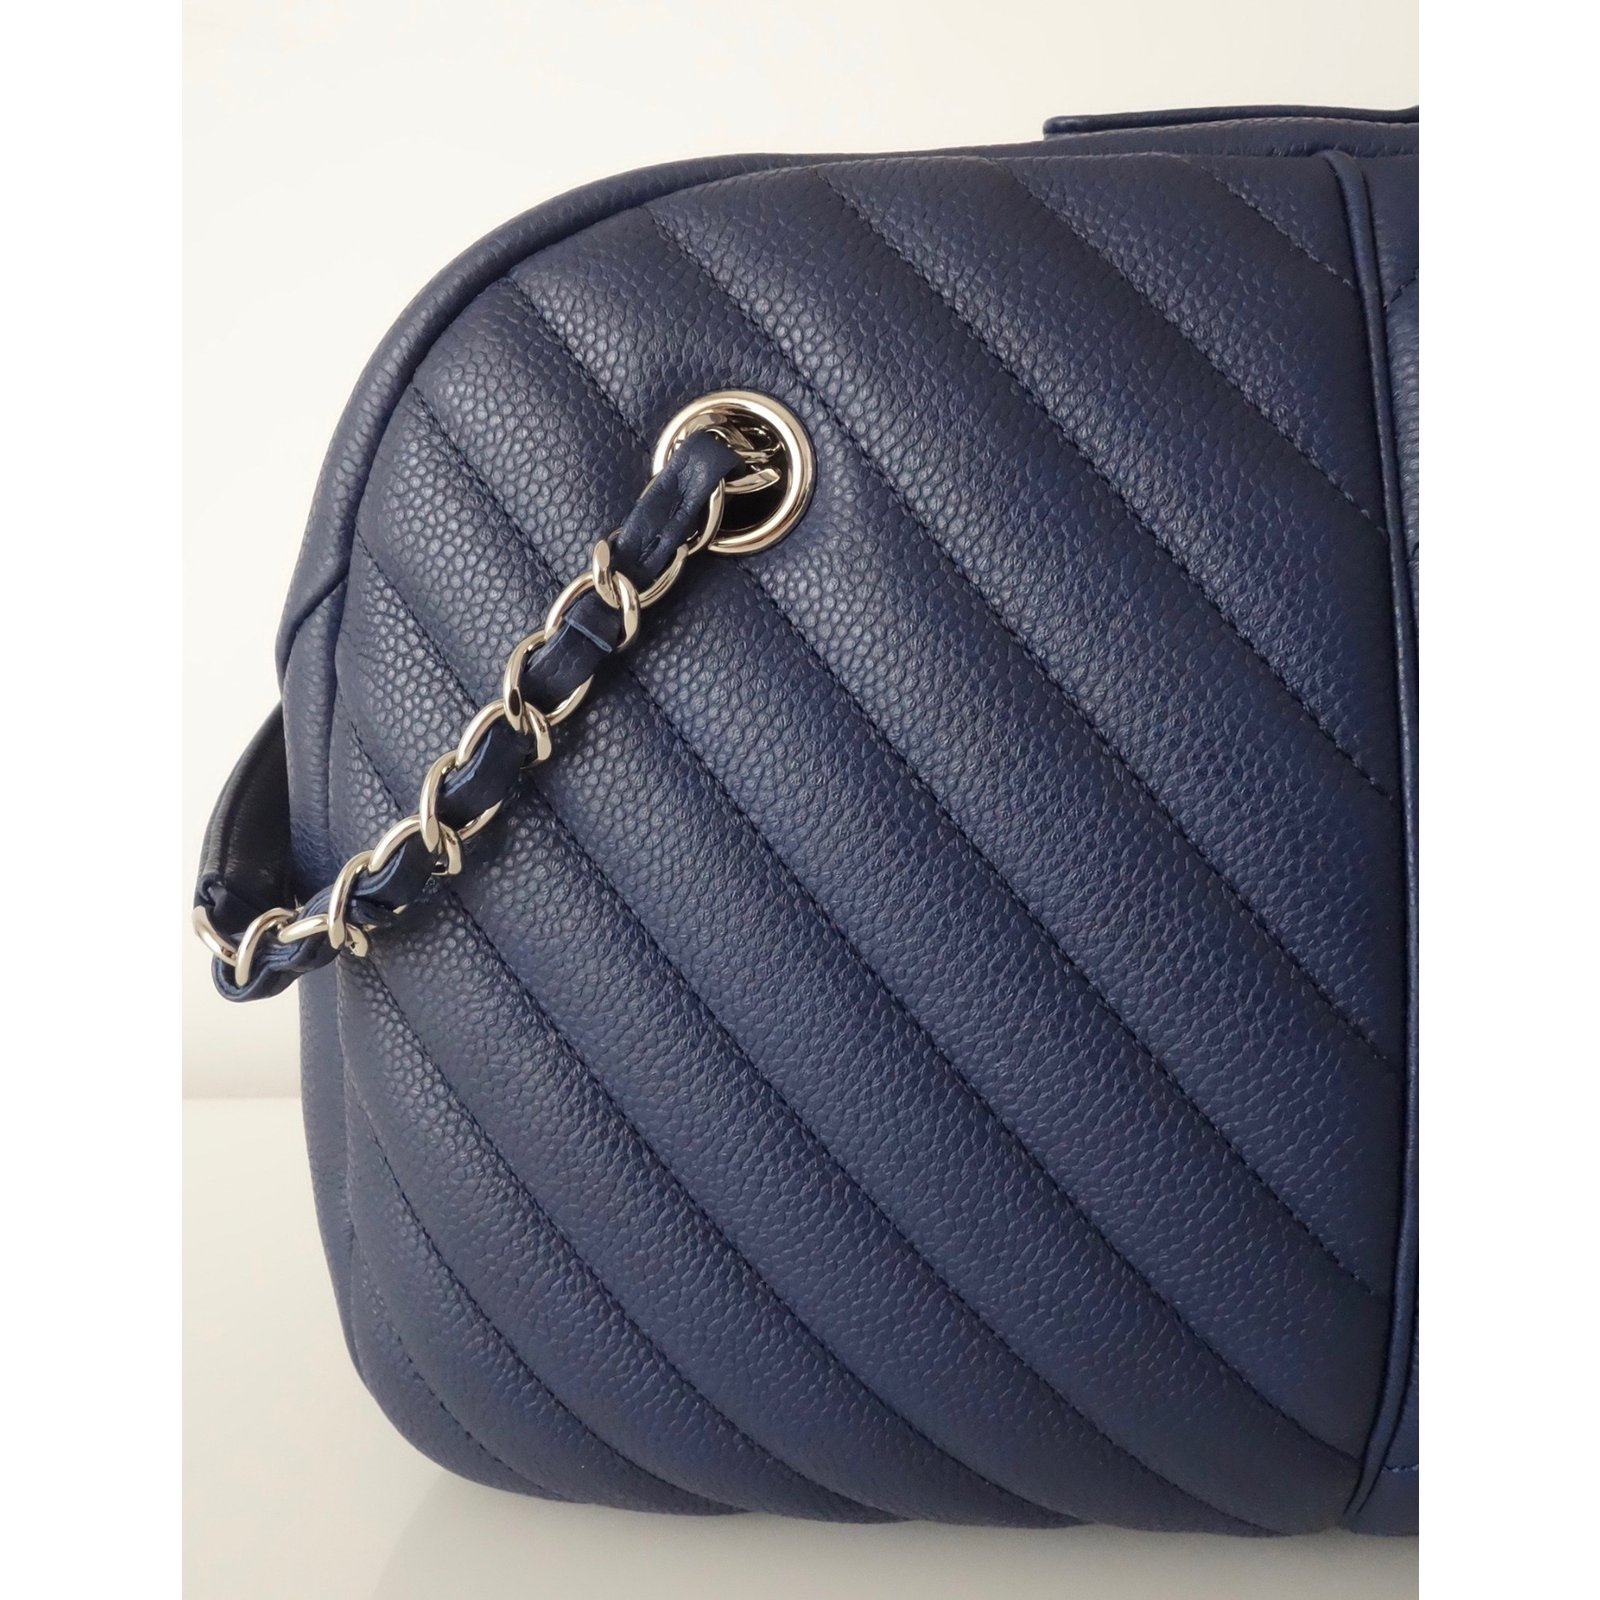 Chanel CHANEL BOWLING CHEVRON Handbags Leather Navy blue ref.64362 - Joli  Closet 0aae3f78d8